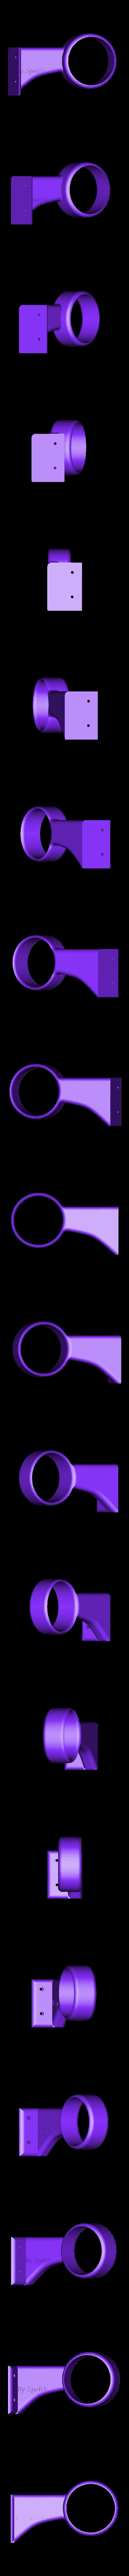 Support_Barre_Rouleau_v1.stl Télécharger fichier STL support bobine imprimante 3d box diamètre 70mm / support bobine imprimante 3d box diamètre 70mm • Design à imprimer en 3D, Spelth